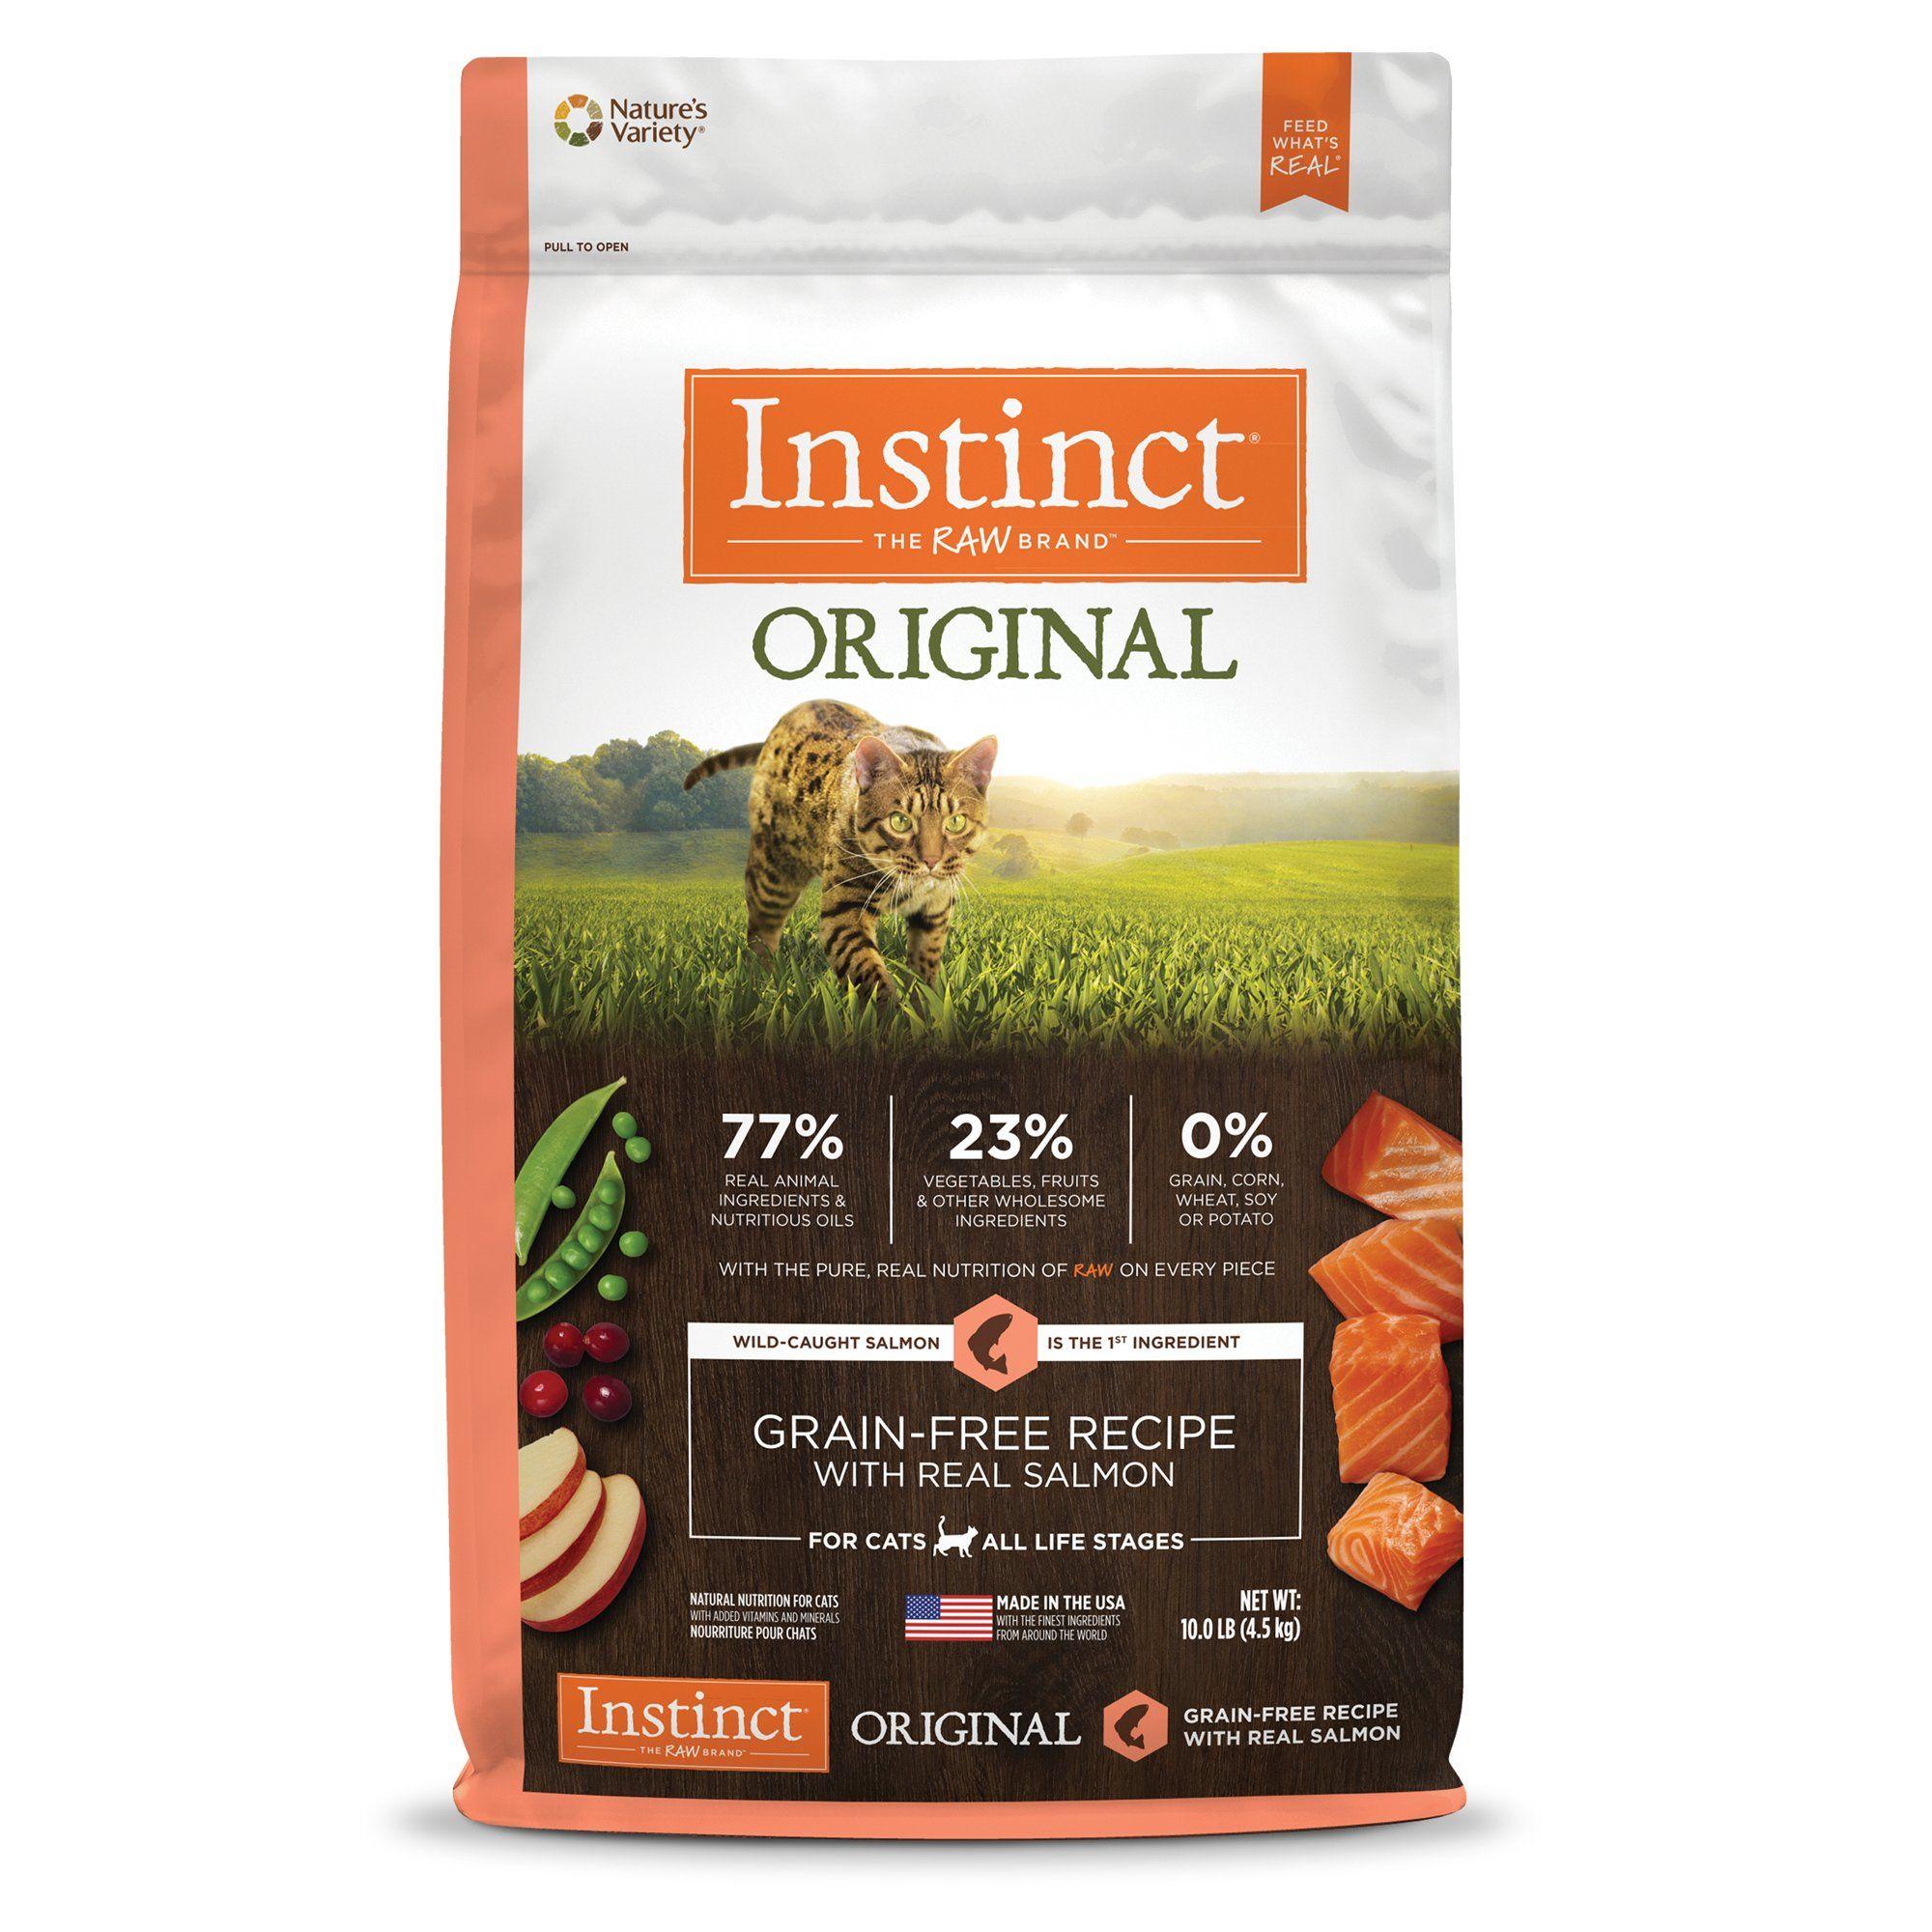 Instinct Original Grain Free Recipe With Real Salmon Natural Dry